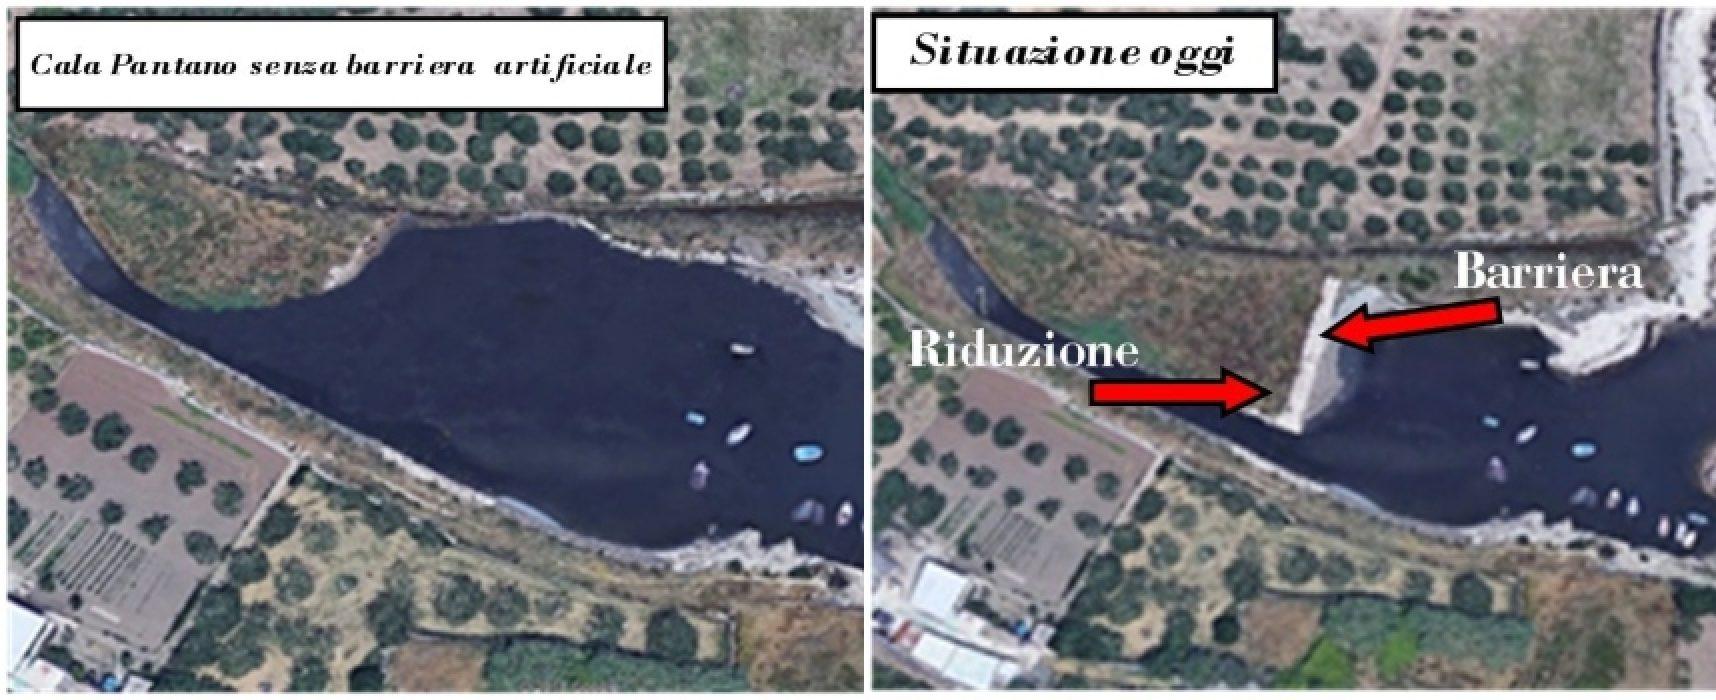 "Pro Natura: ""Cala del Pantano ecosistema a rischio"""